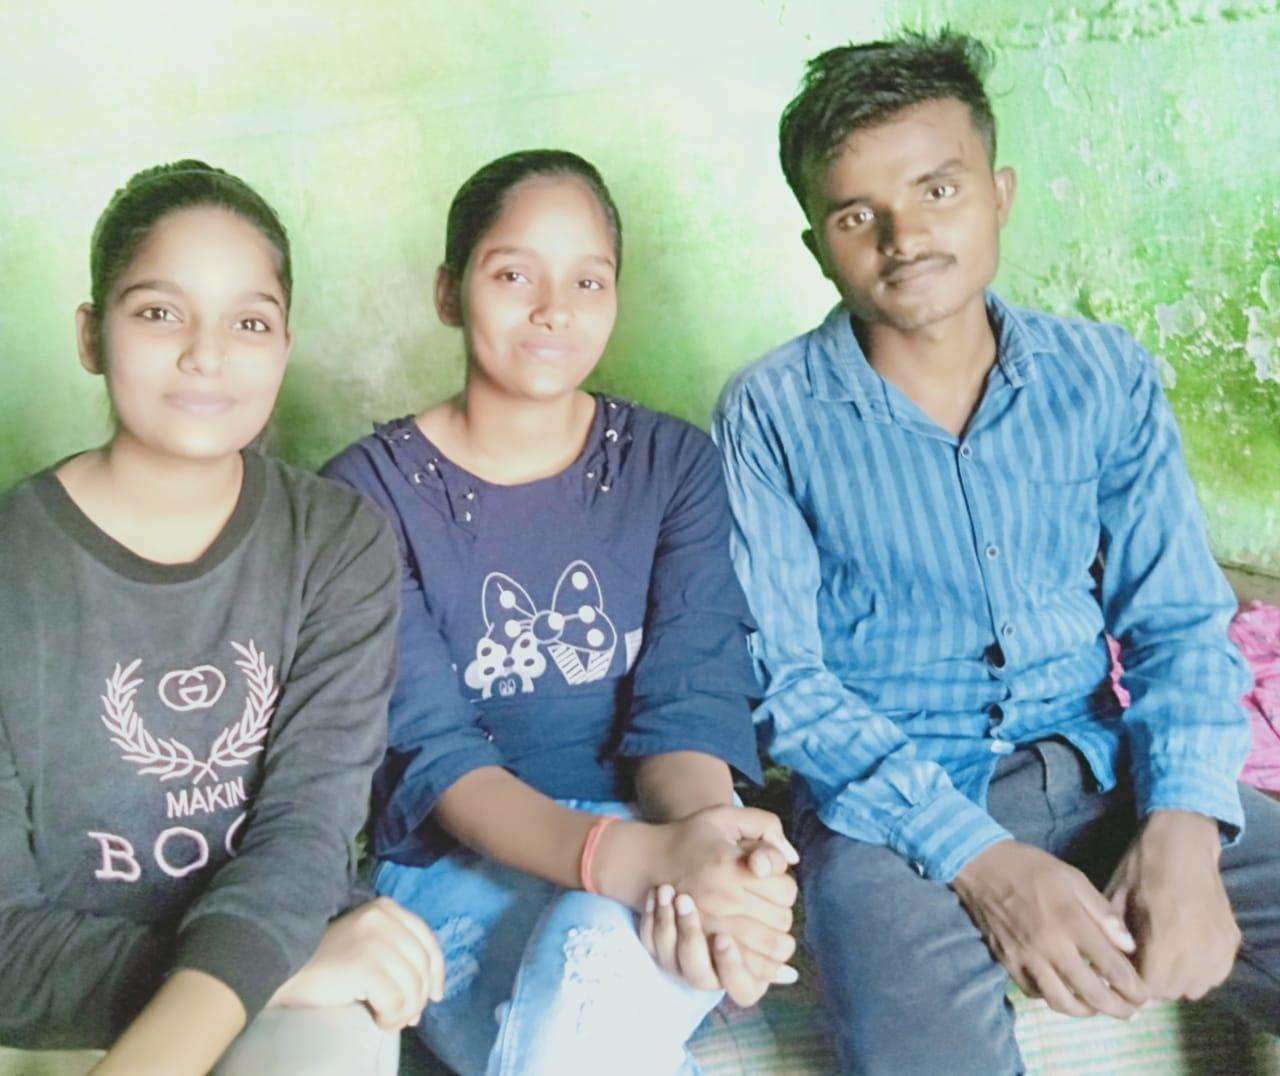 Gujarat Cattle Feed Seller's Daughter